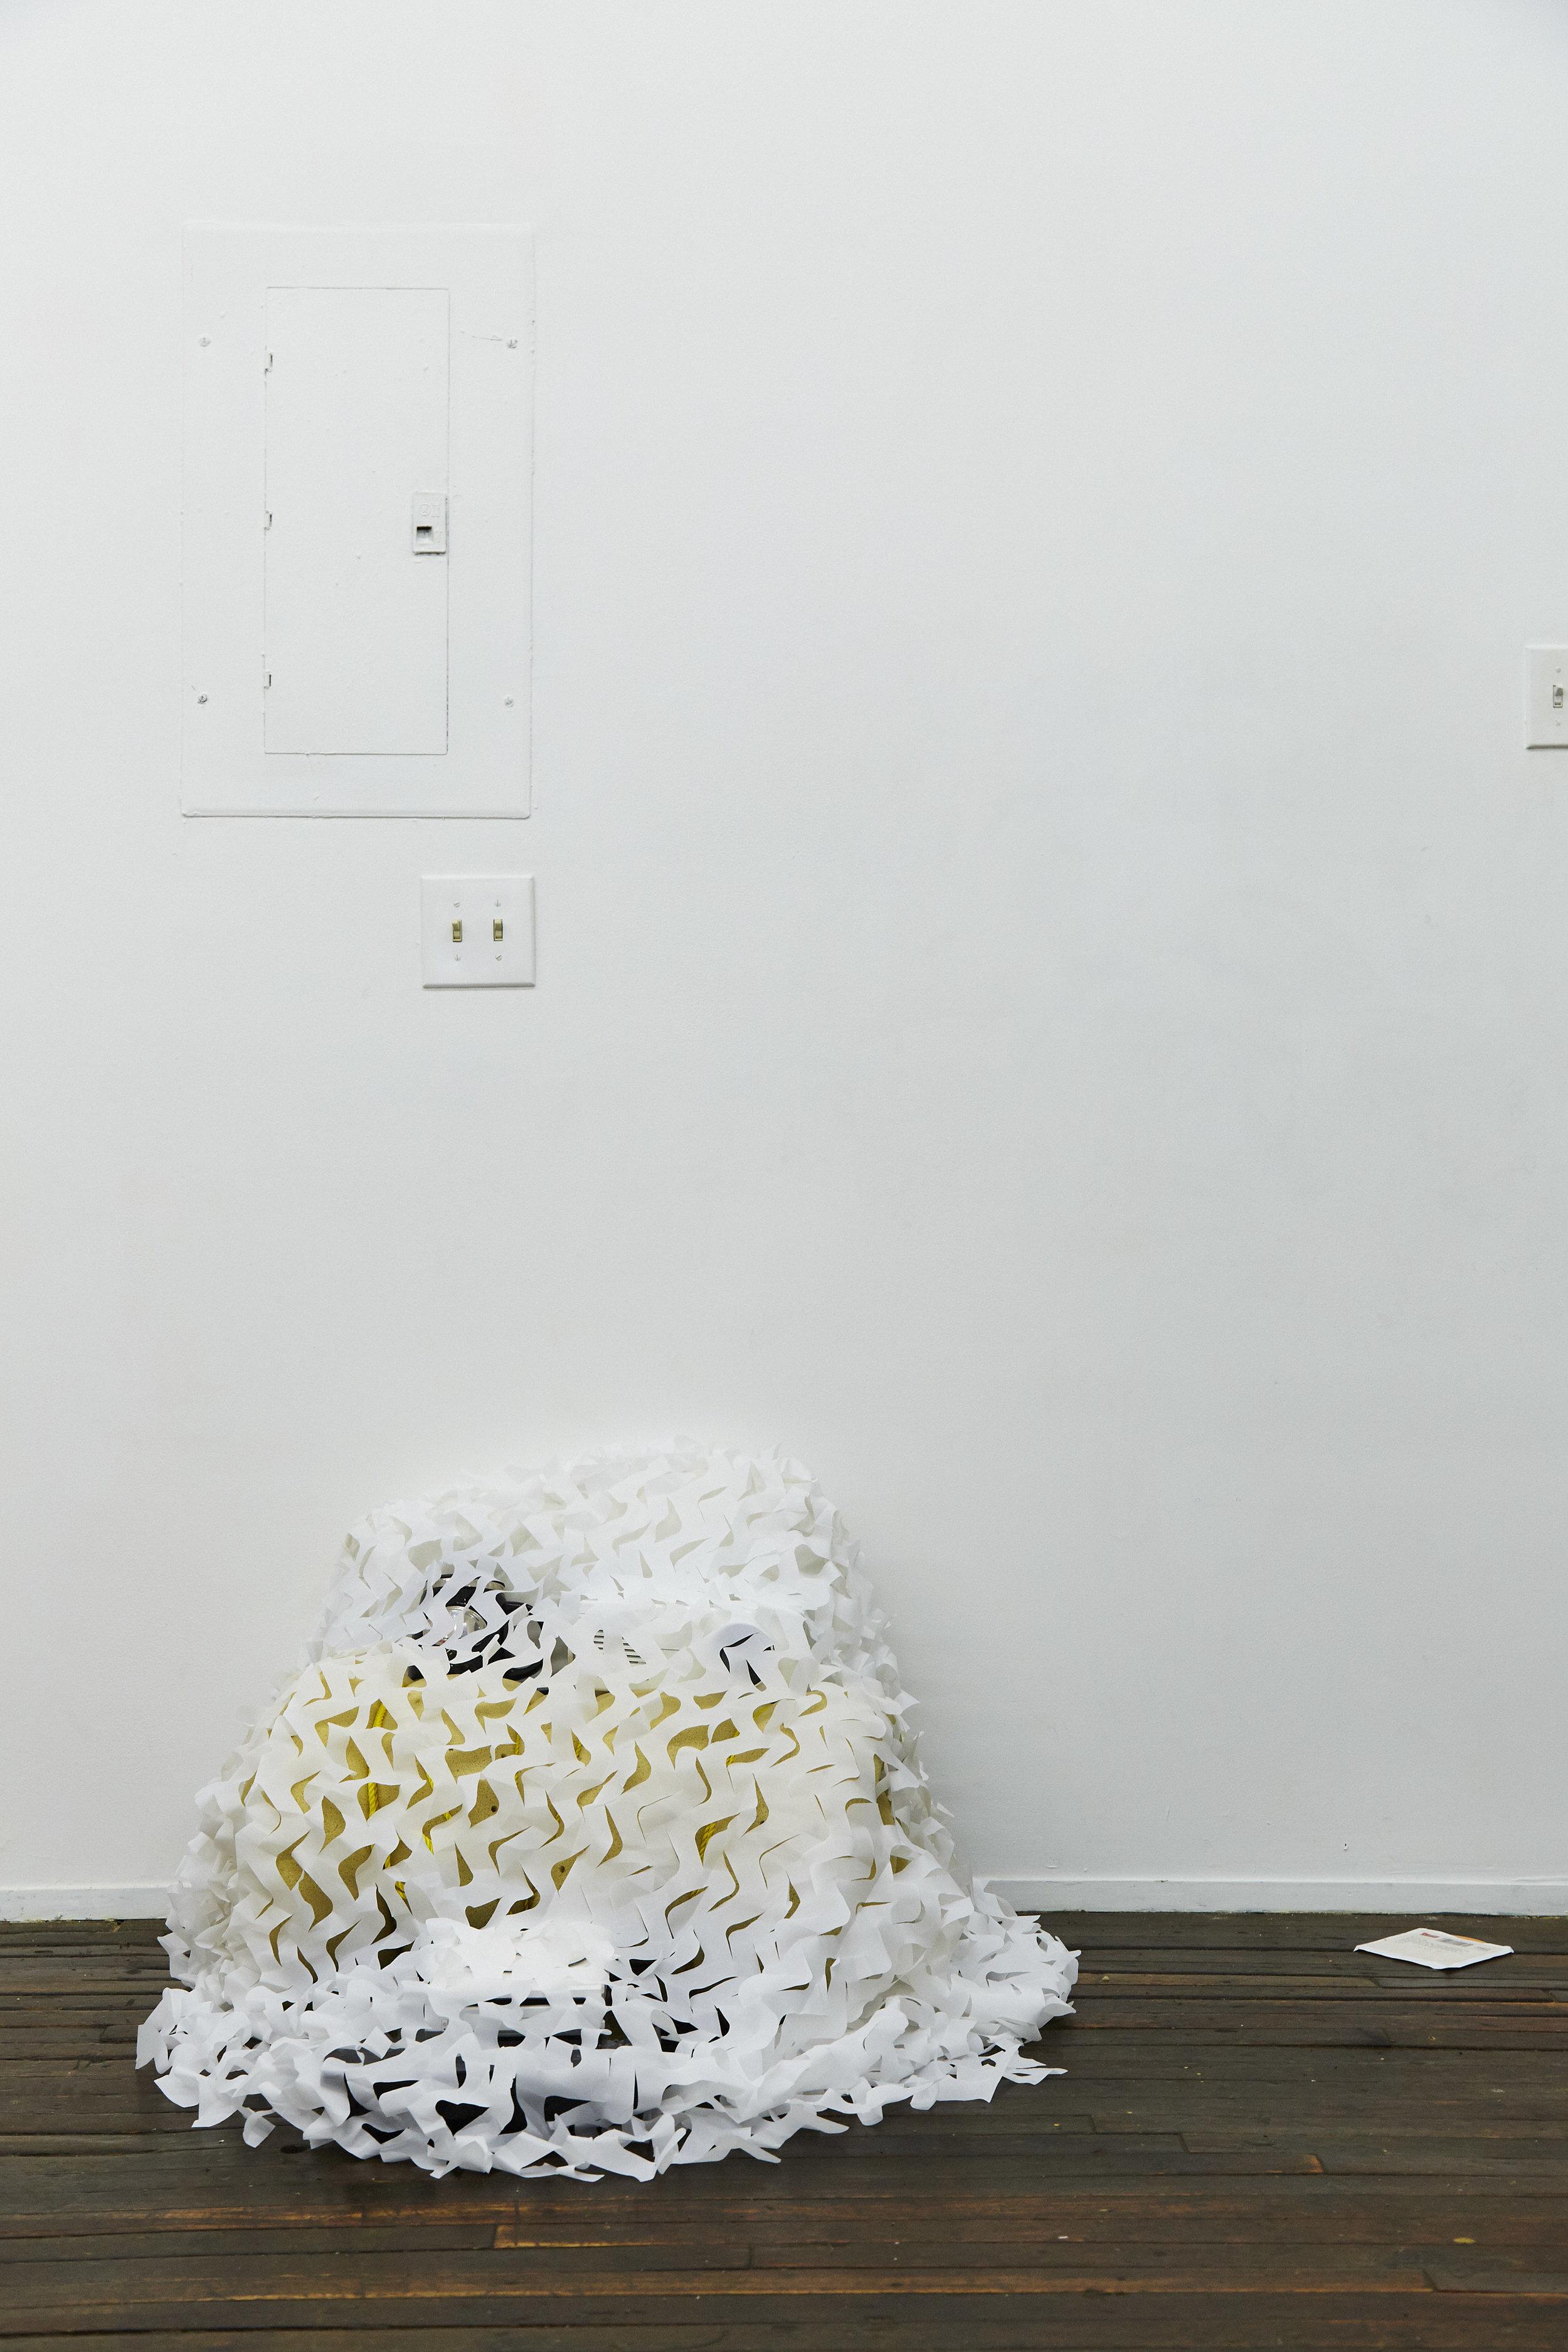 Michael Assiff,  Cache , Wii, induction burner, memory foam, pillow, engraved mug, camo net, 2017